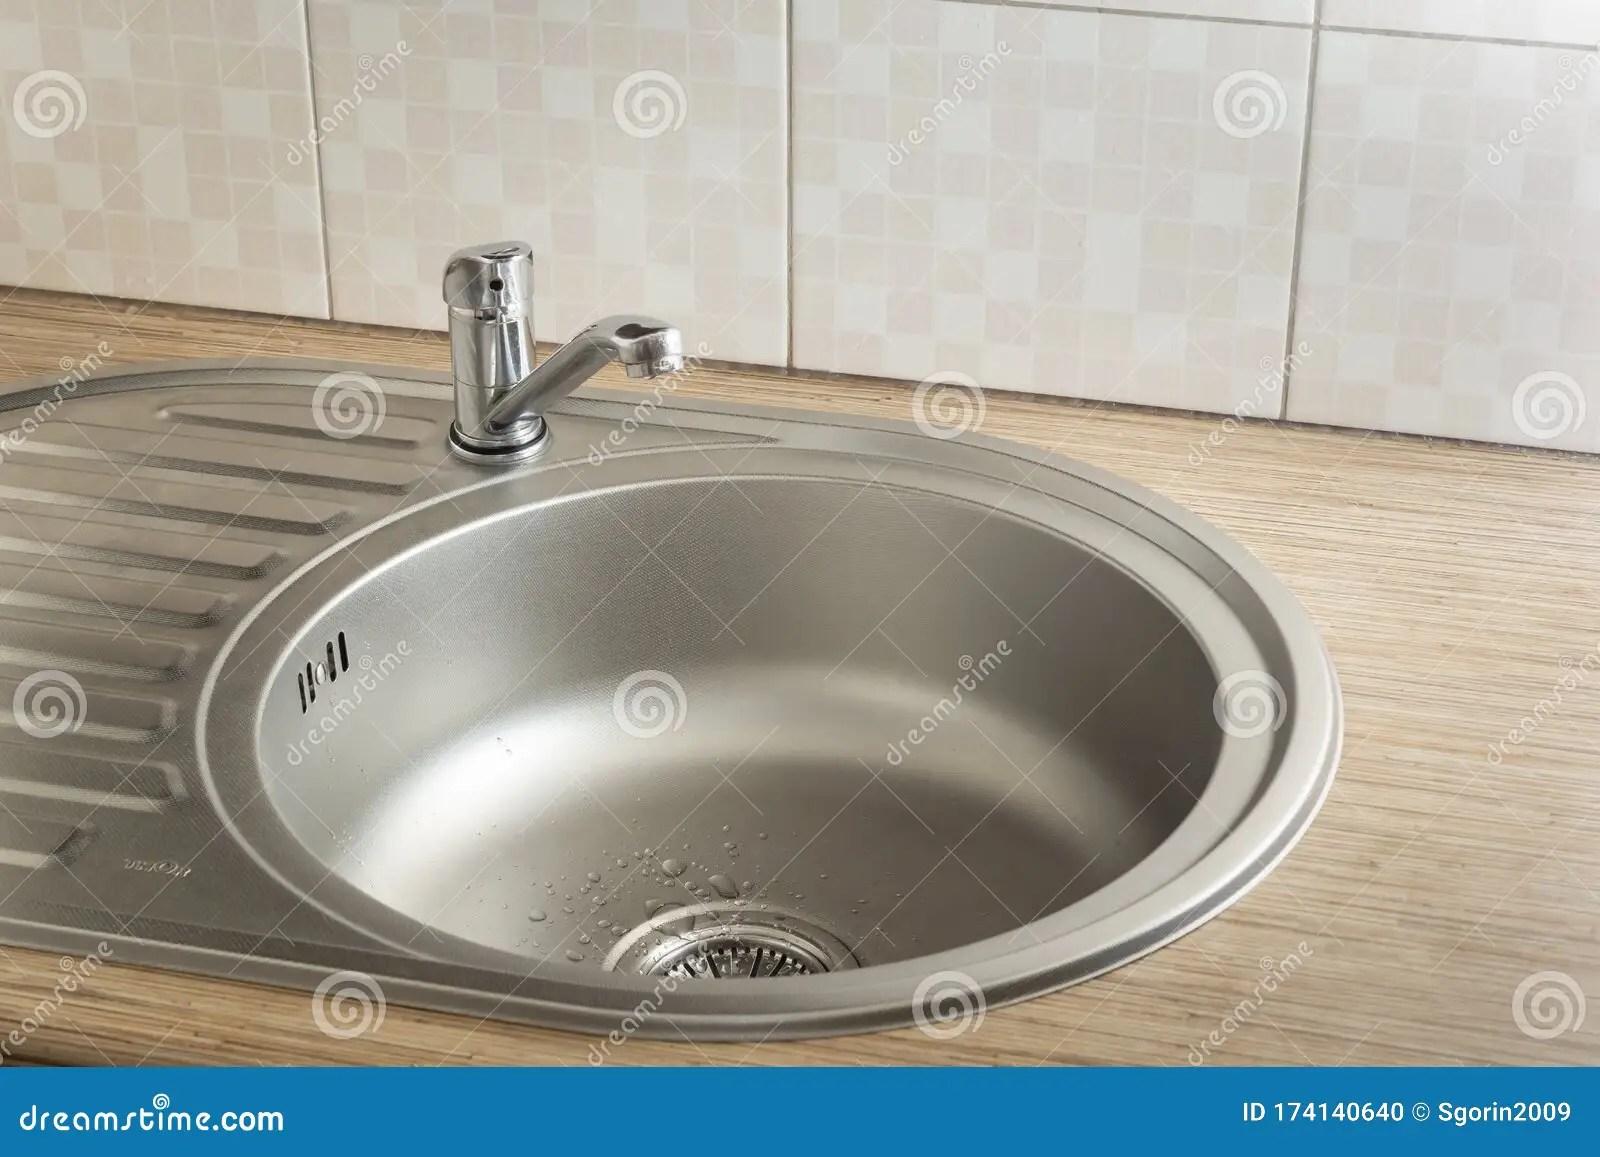 https www dreamstime com clean round metal kitchen sink faucet water drops leak clean round metal sink kitchen faucet water image174140640